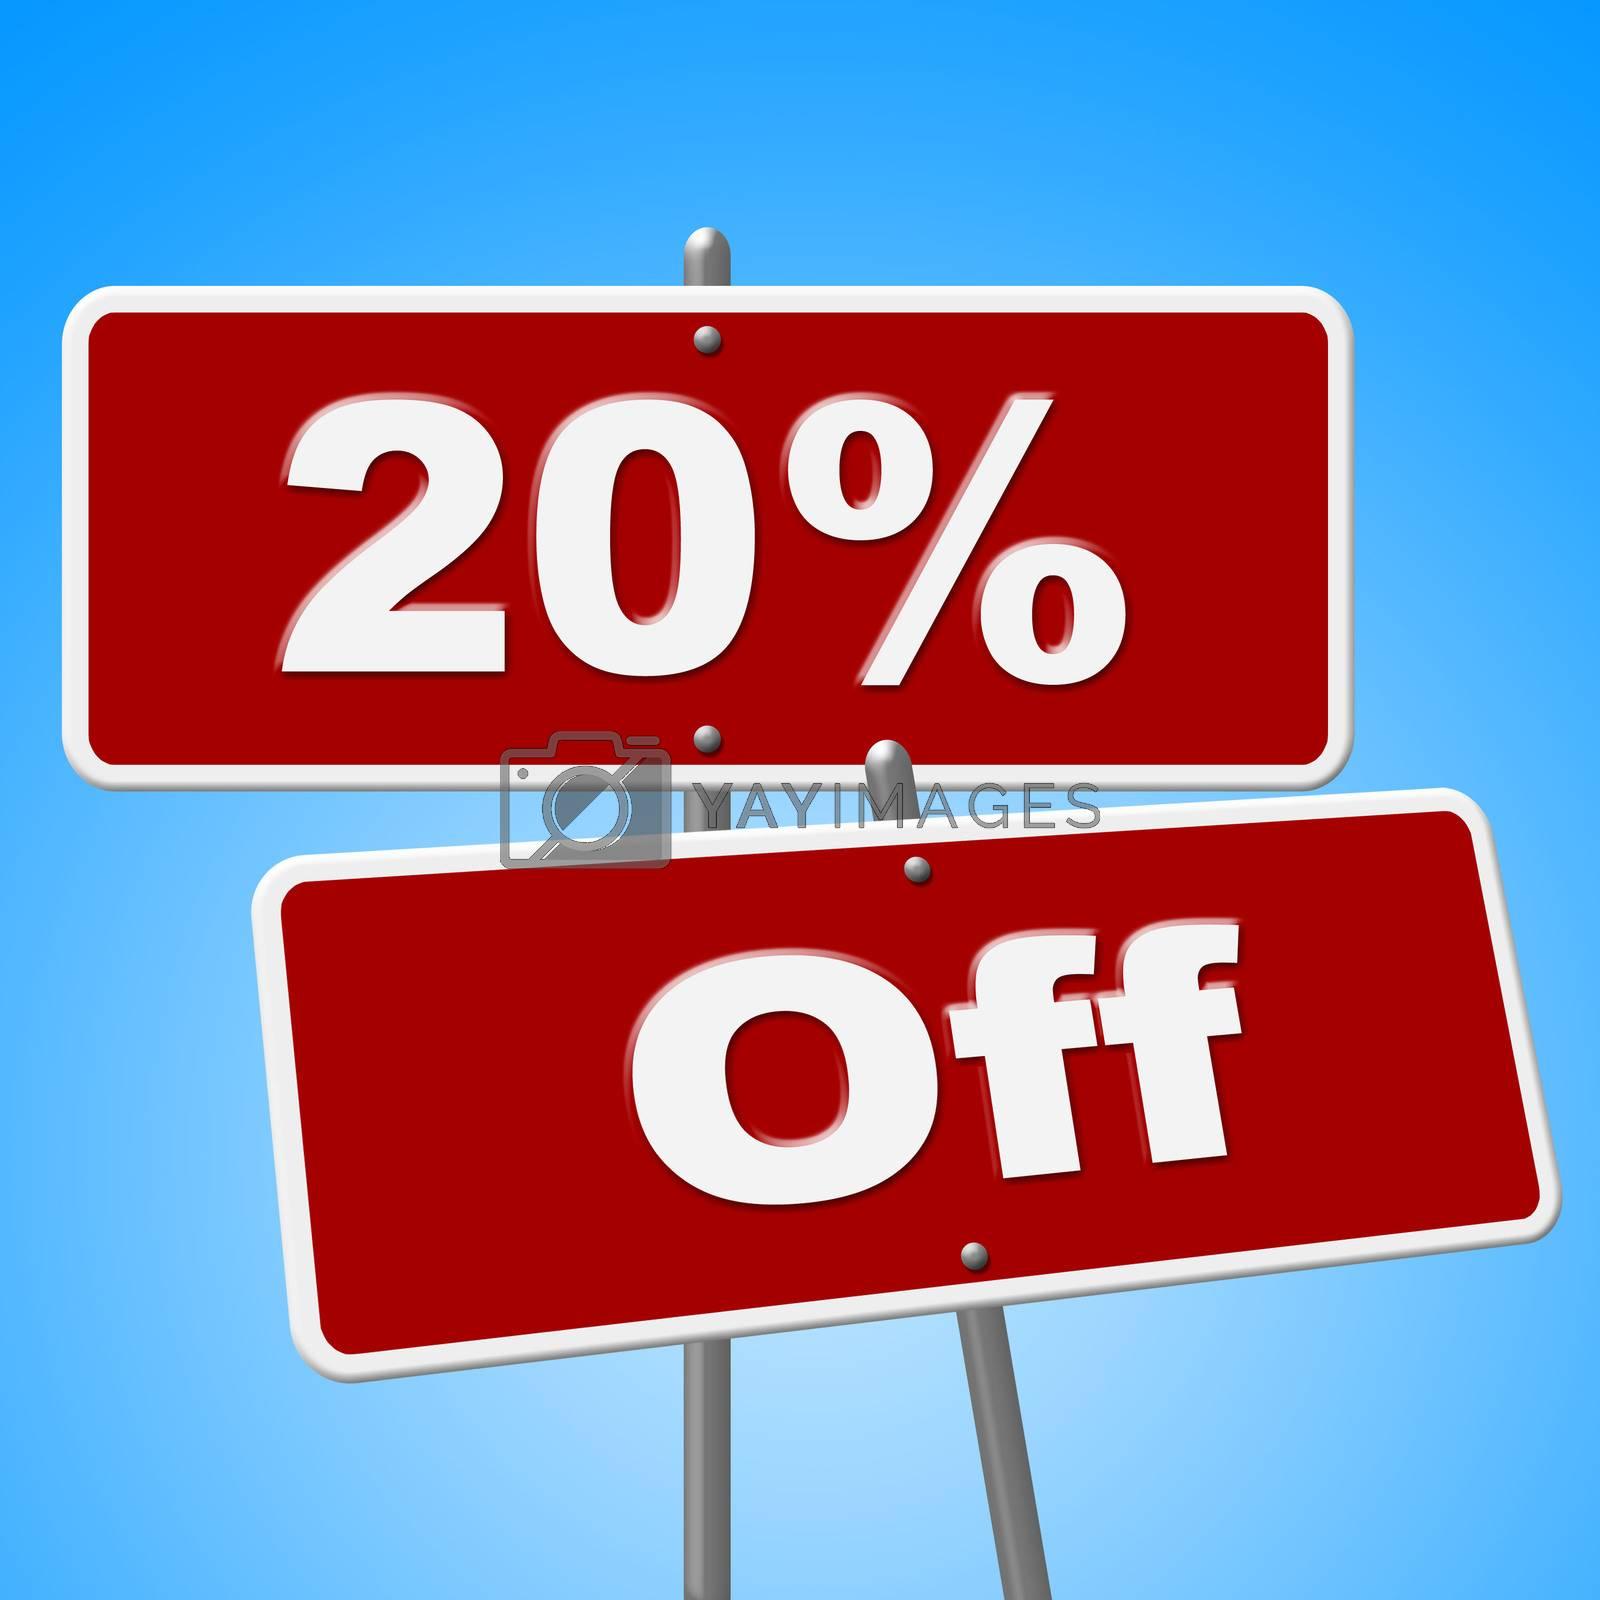 Twenty Percent Off Shows Promo Discounts And Merchandise by stuartmiles